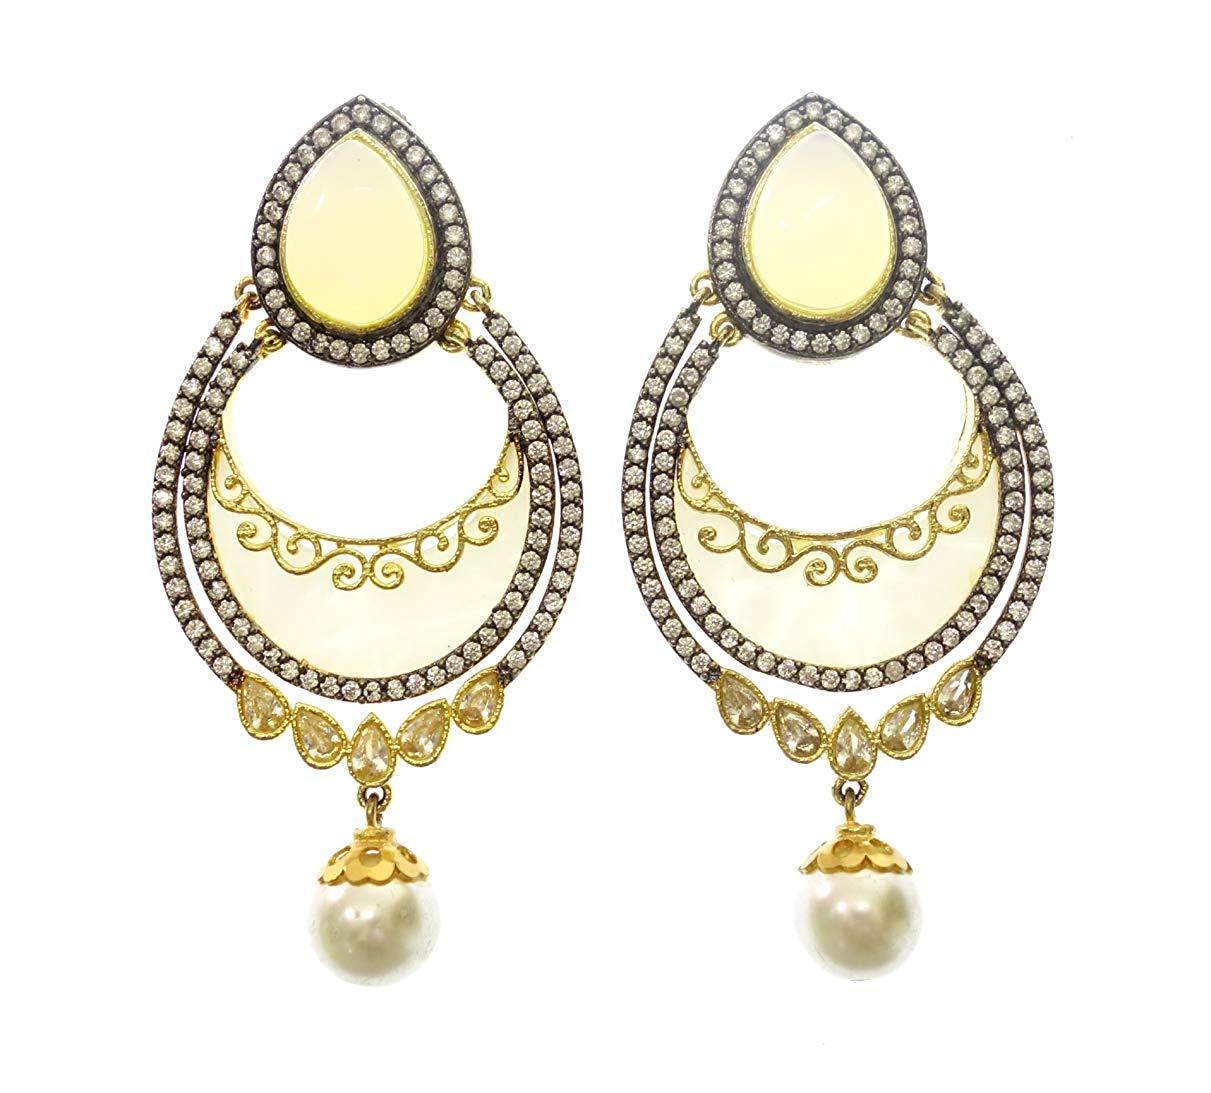 Cheap 22 Carat Gold Earrings Design Find 22 Carat Gold Earrings